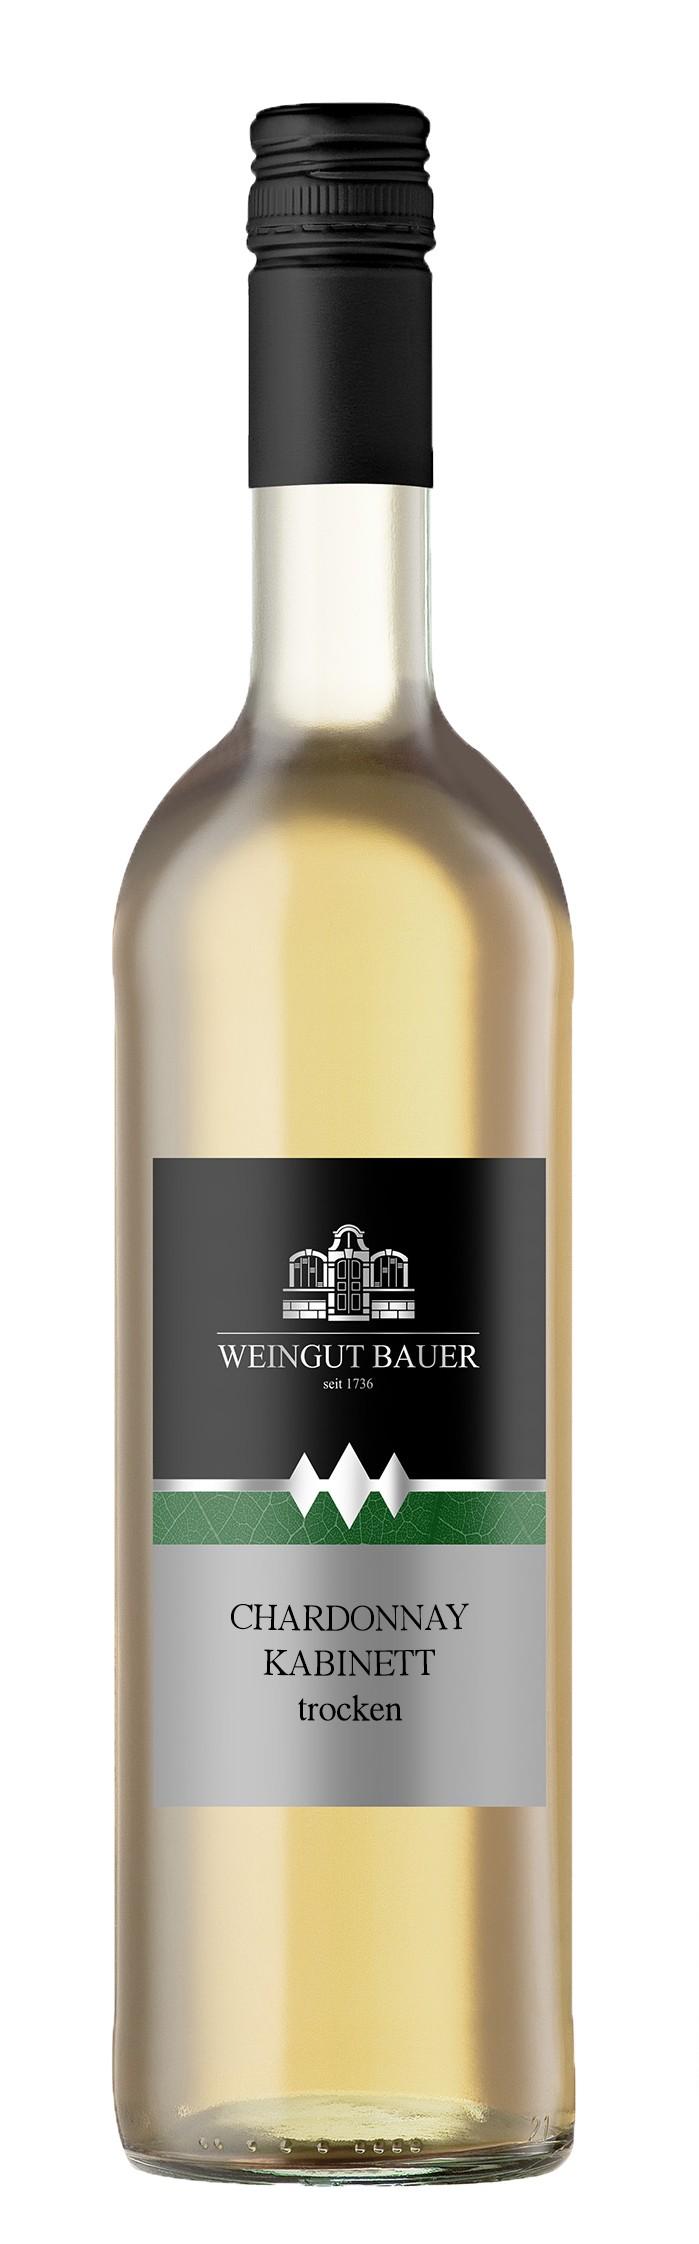 2015 Chardonnay Kabinett trocken - 750ml